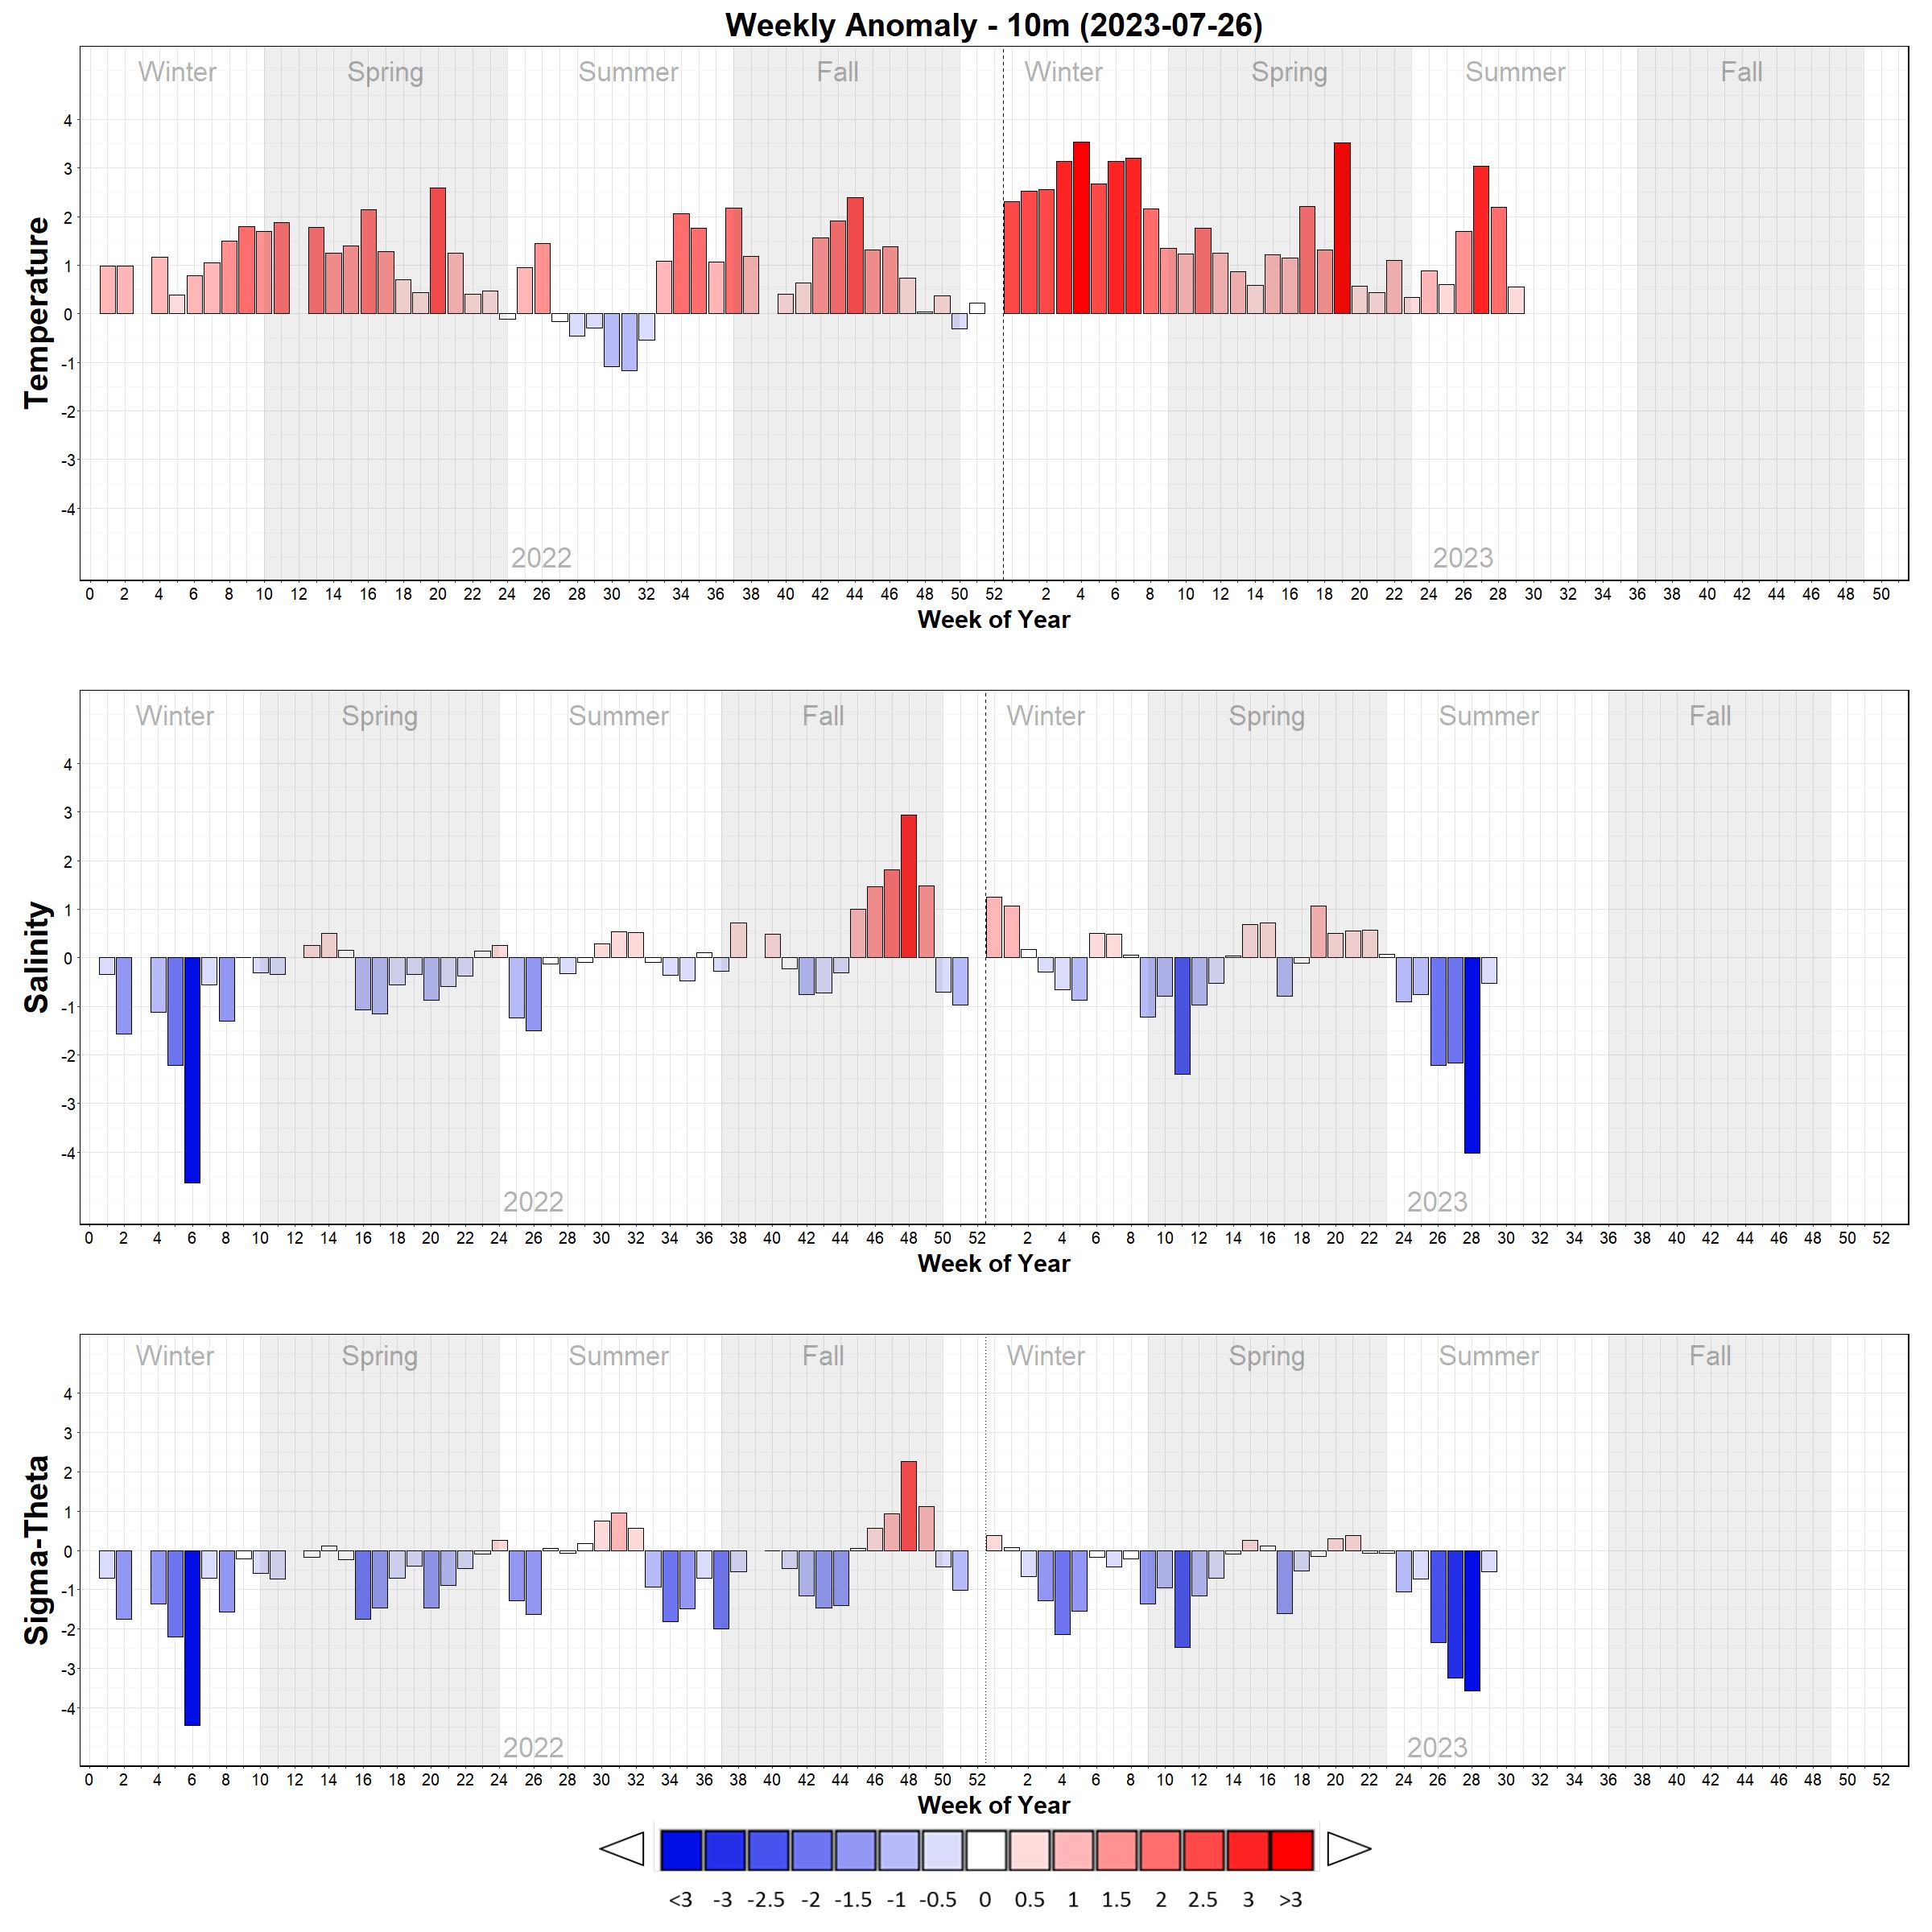 Temperature and Salinity Weekly Anomaly Bar Plots - 10m